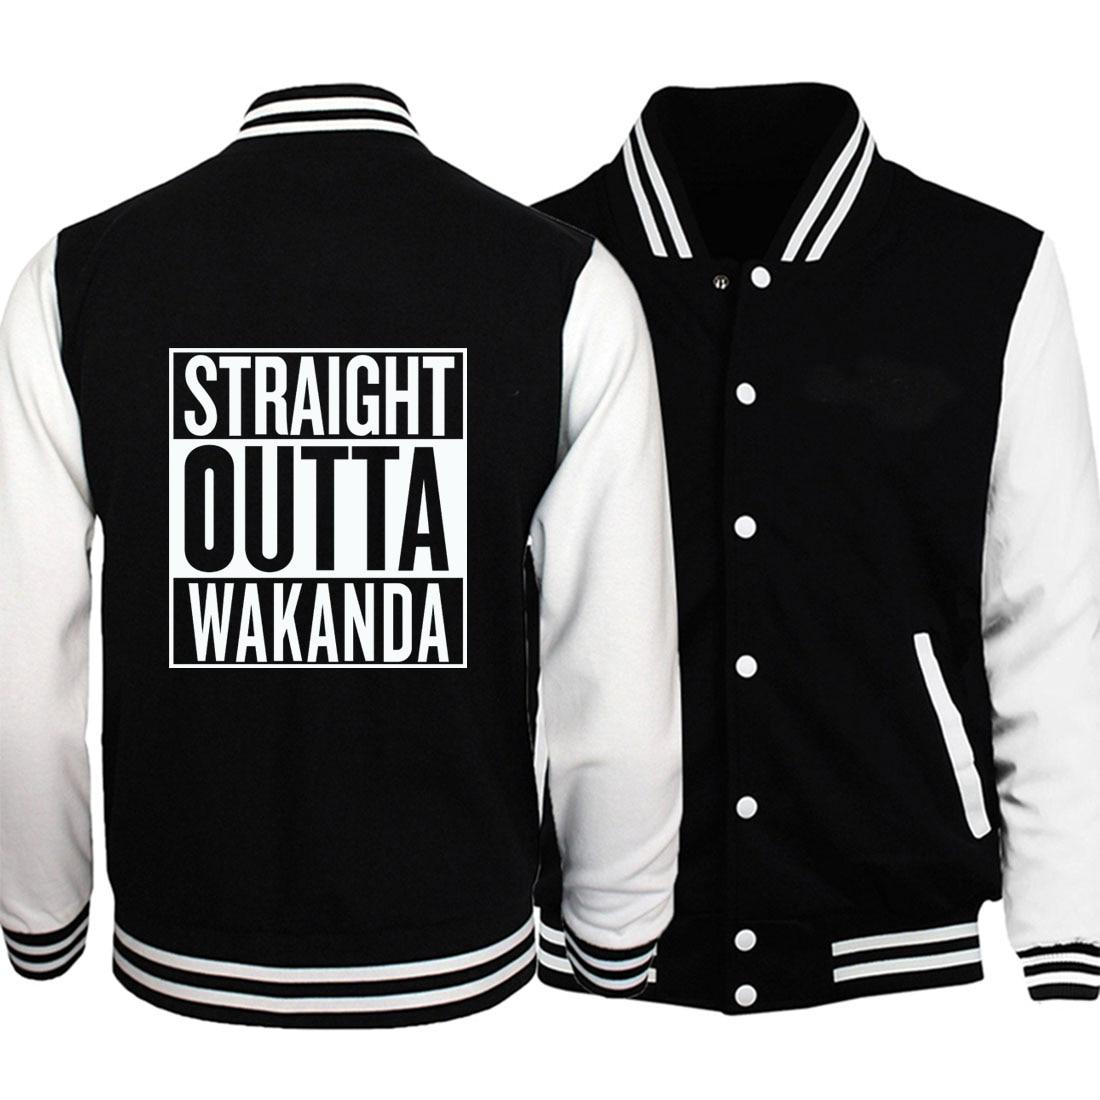 fall winter casual fleece sweatshirts Men 2019 new marvel baseball jackets Black Panther male fitness coats harajuku tracksuits